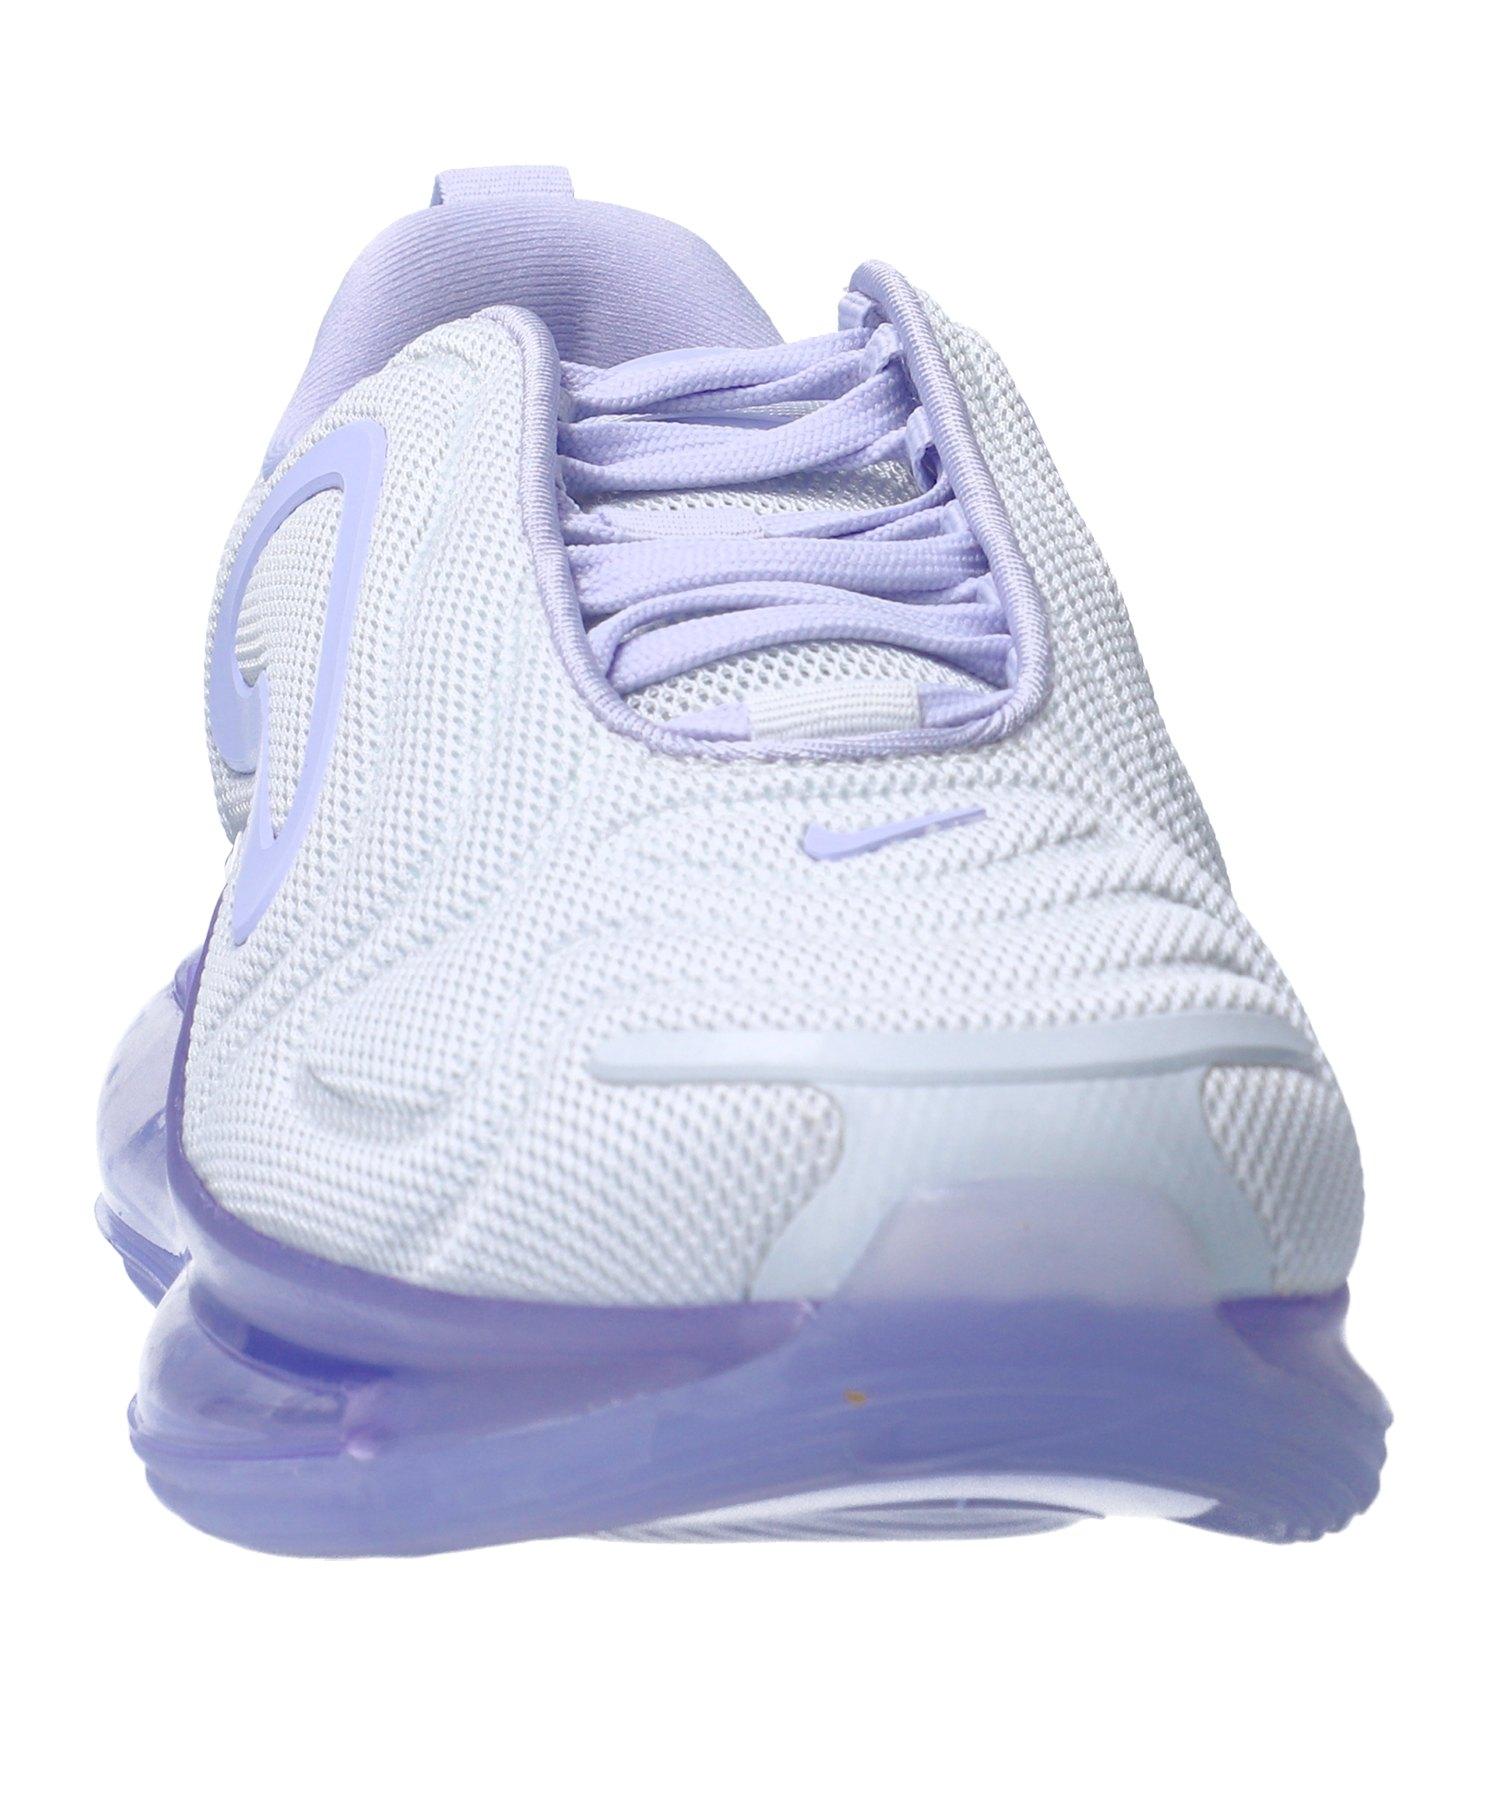 Nike Air Max 720 Sneaker Damen Weiss Lila F009